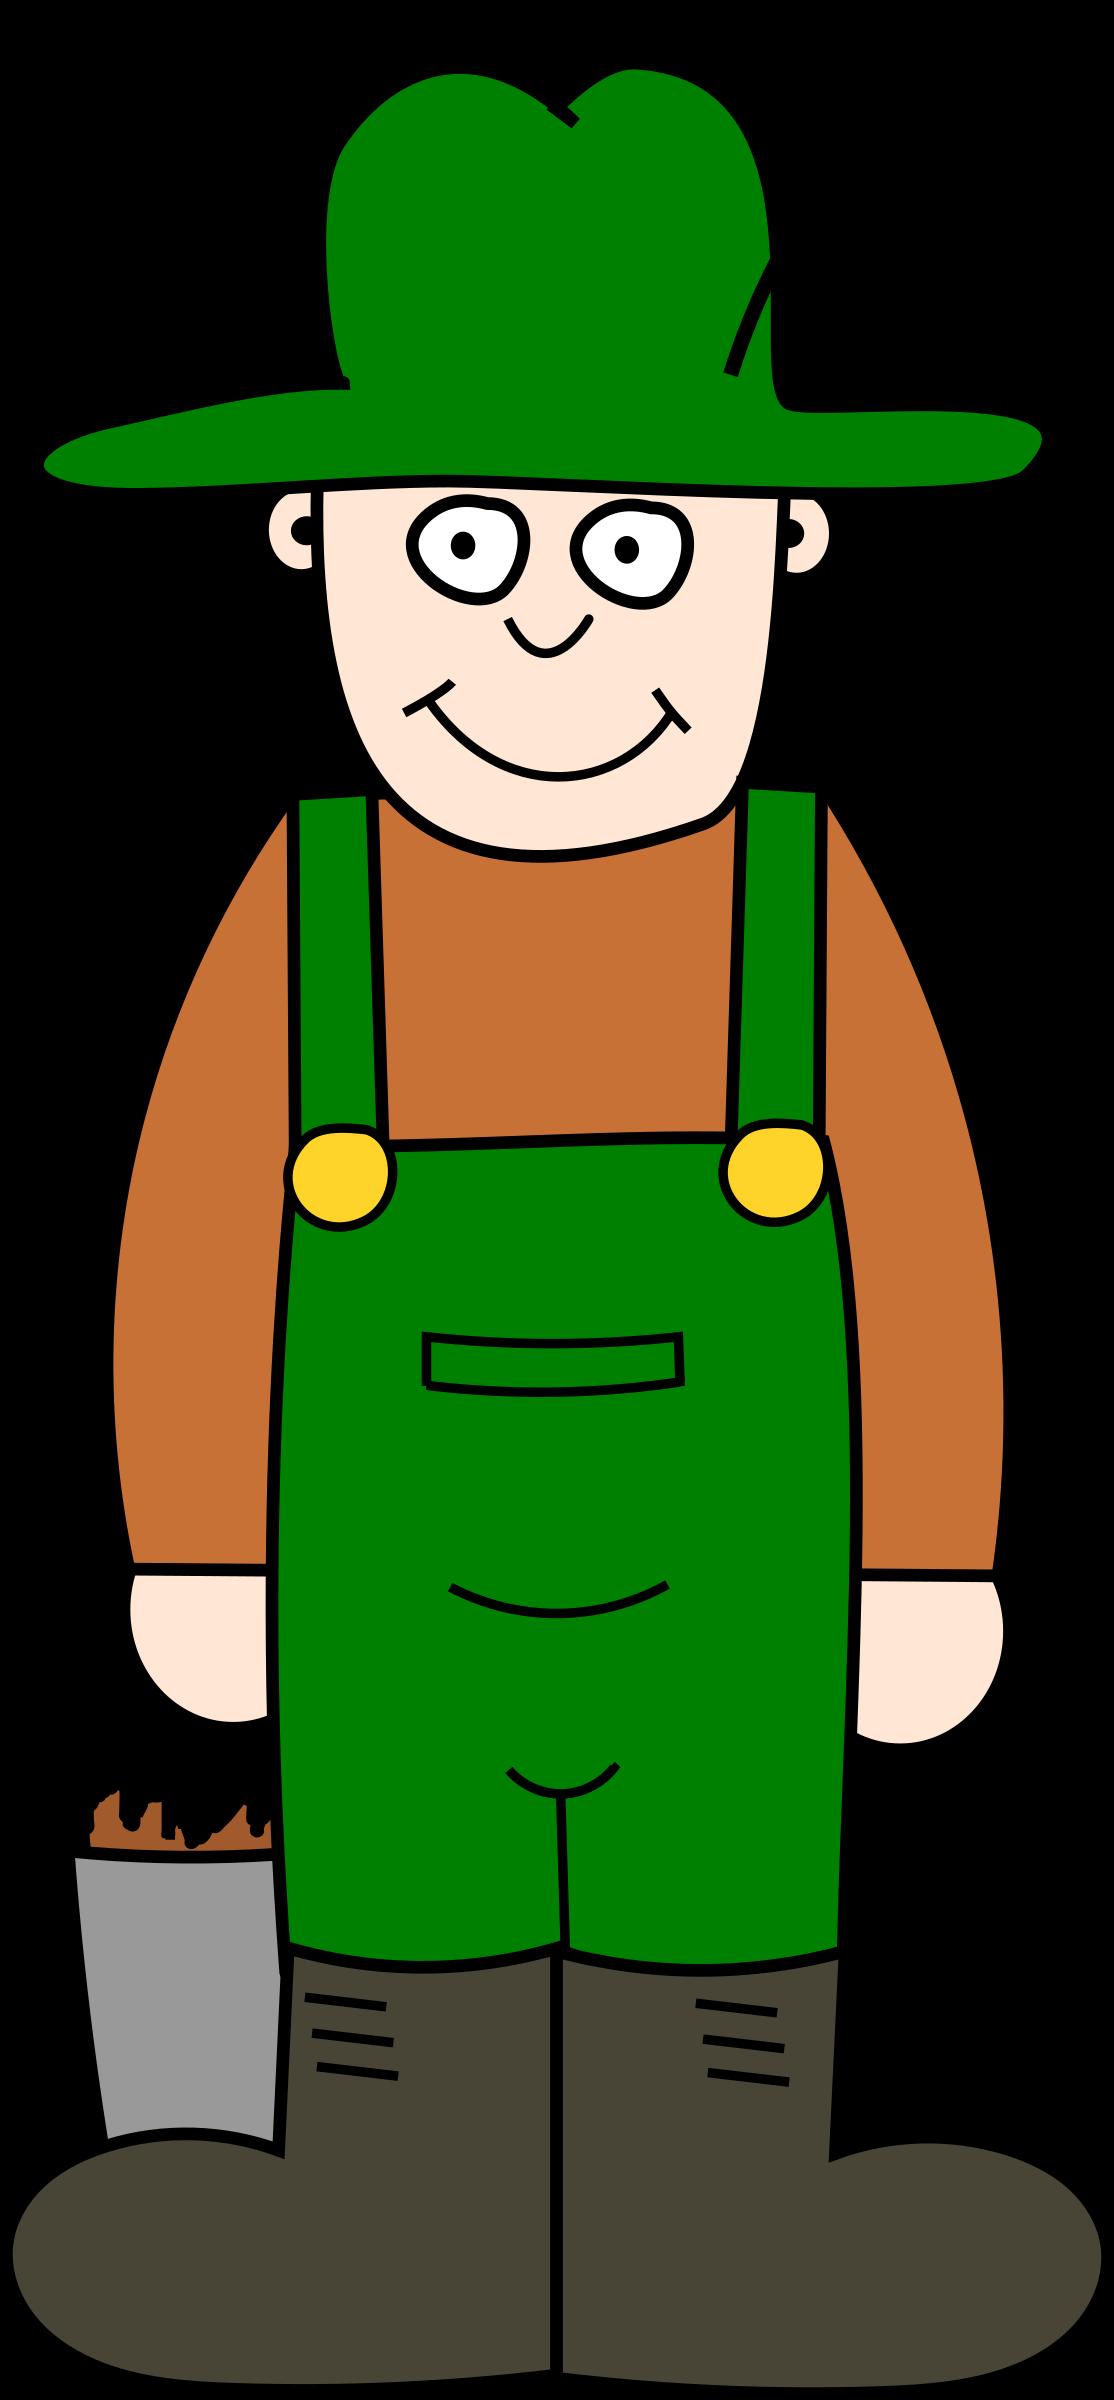 Cartoon farmer big image. Farmers clipart hat